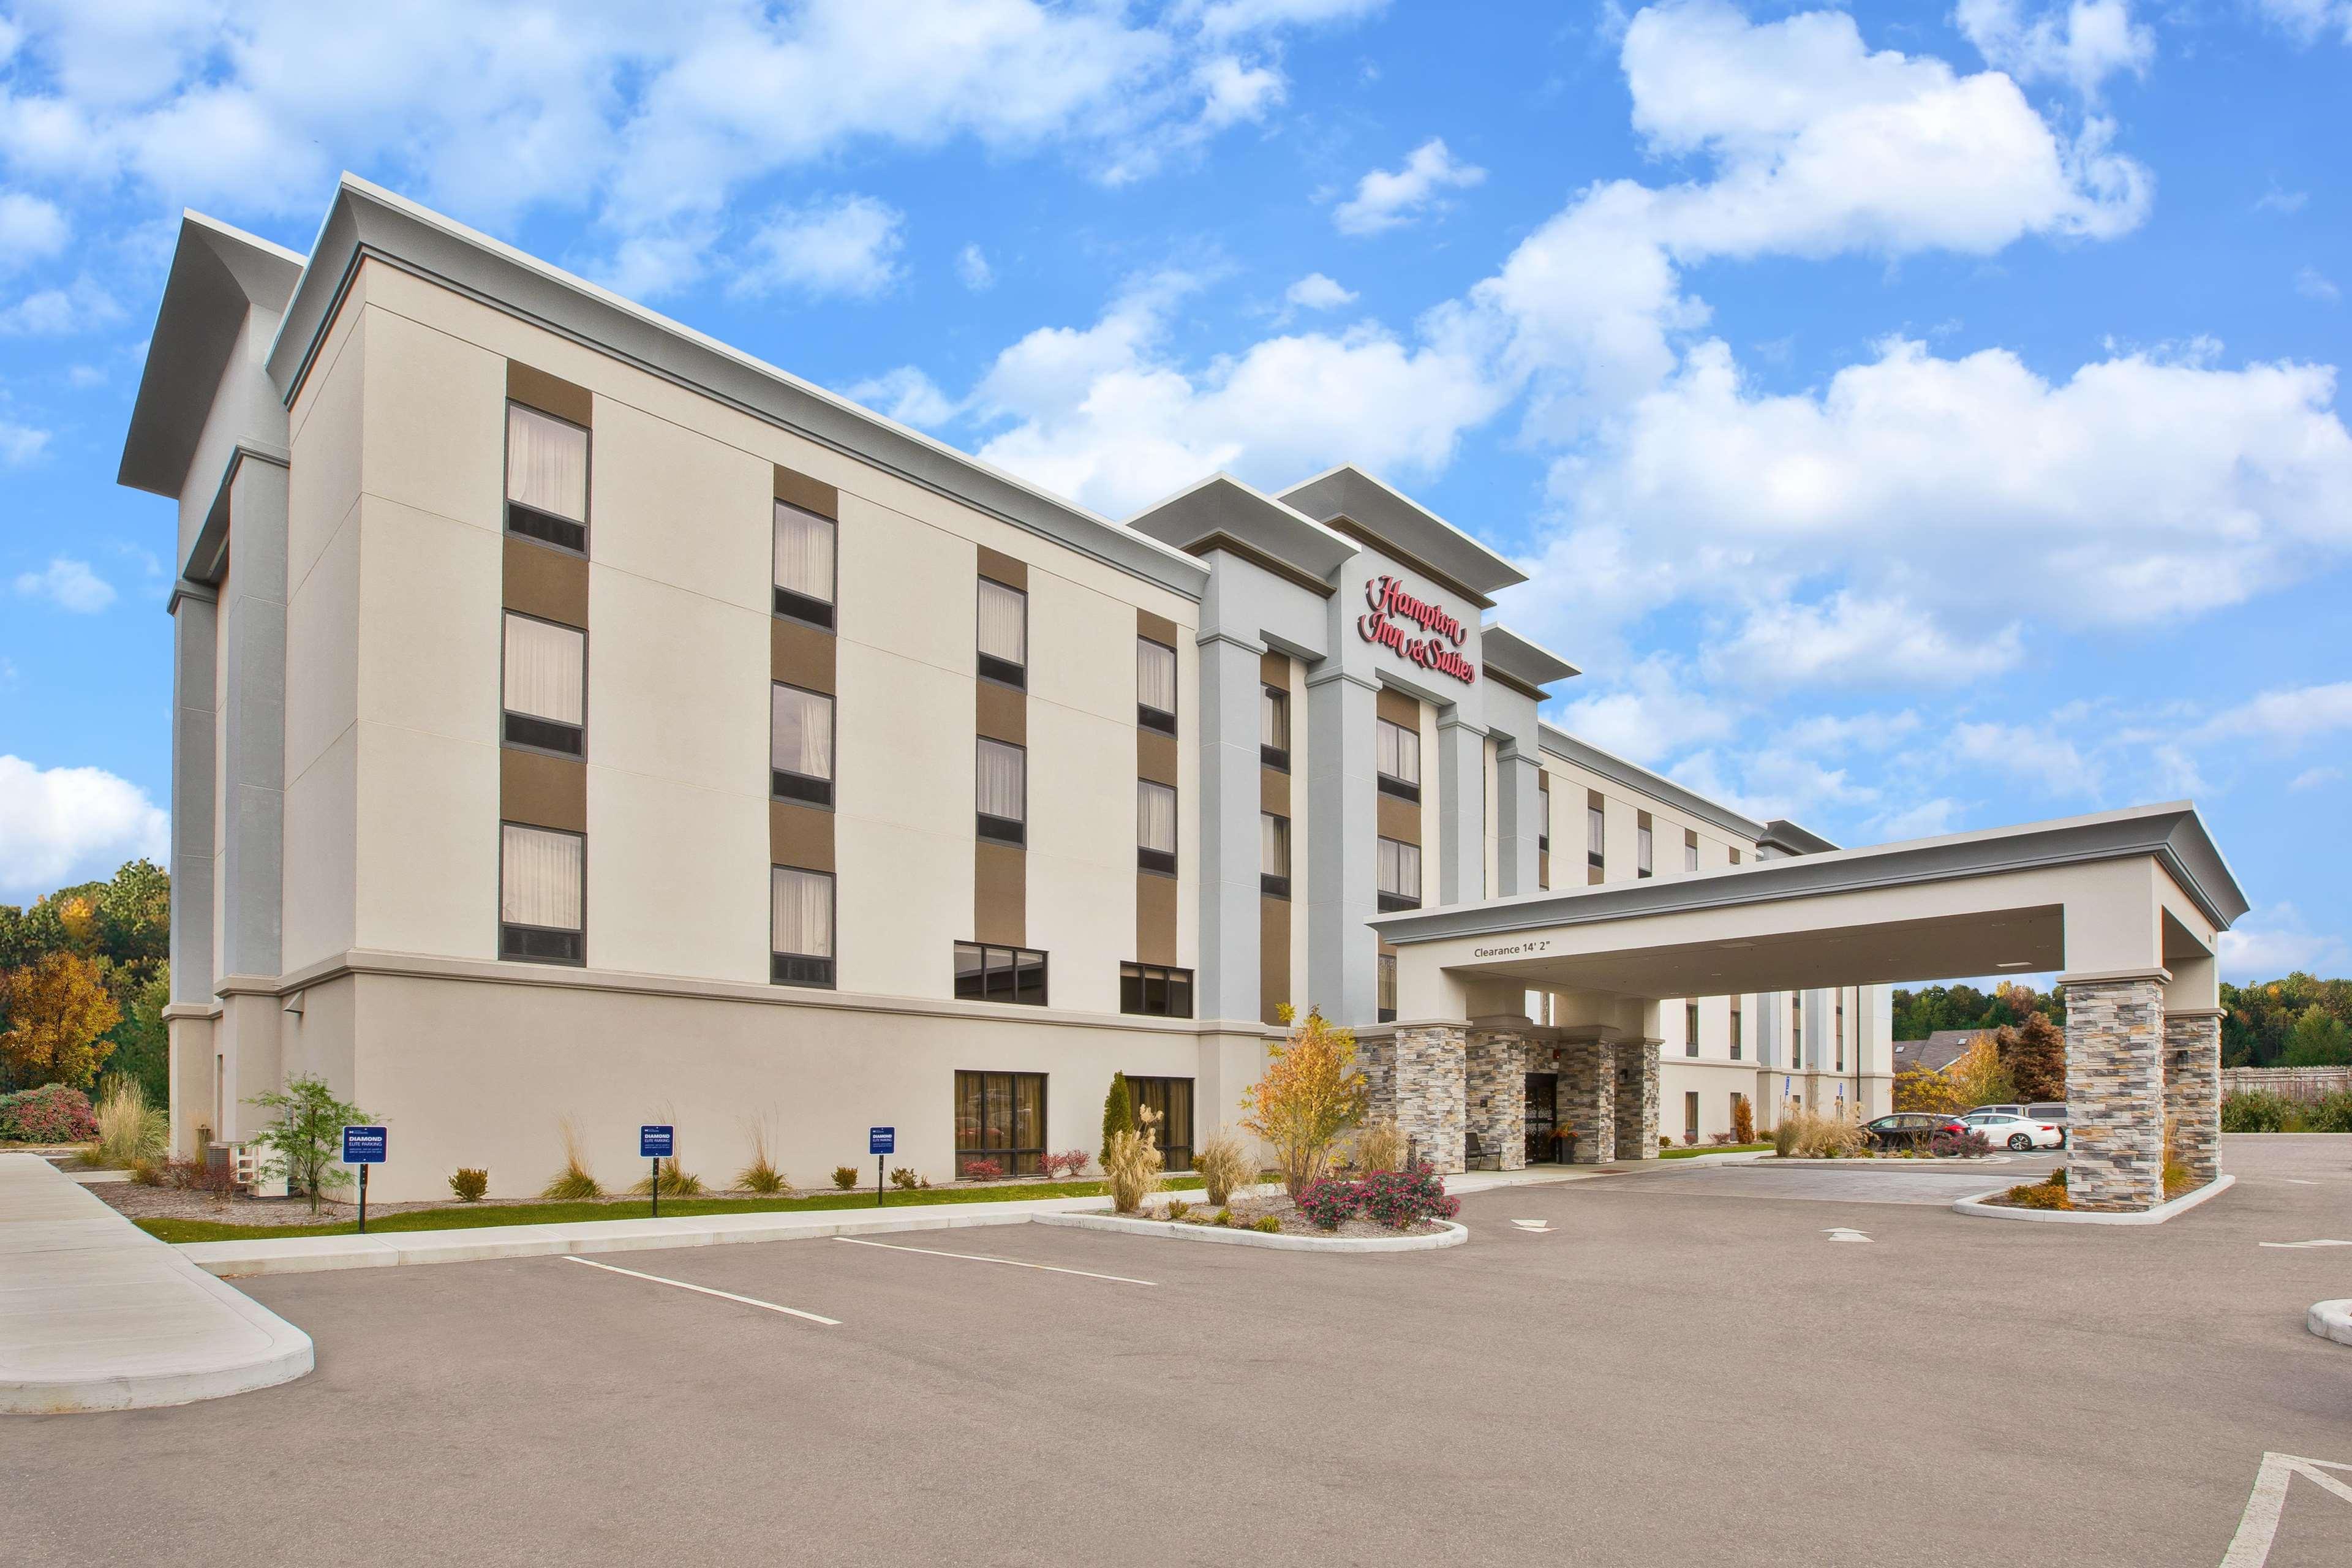 Hampton Inn & Suites Alliance image 0